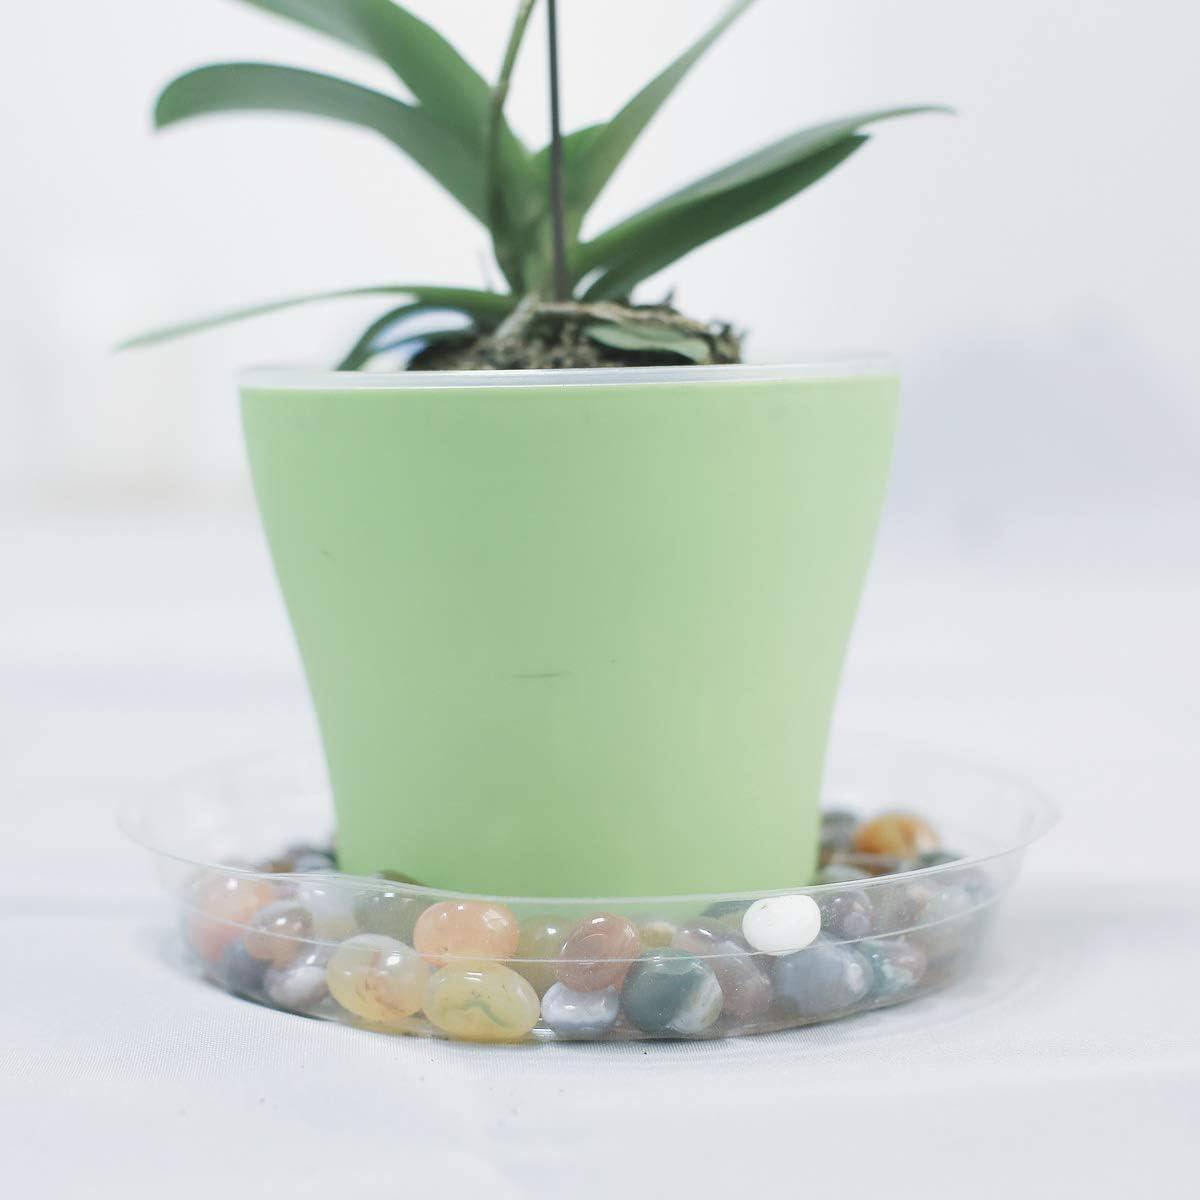 Truedays Clear Plastic Plant Saucers